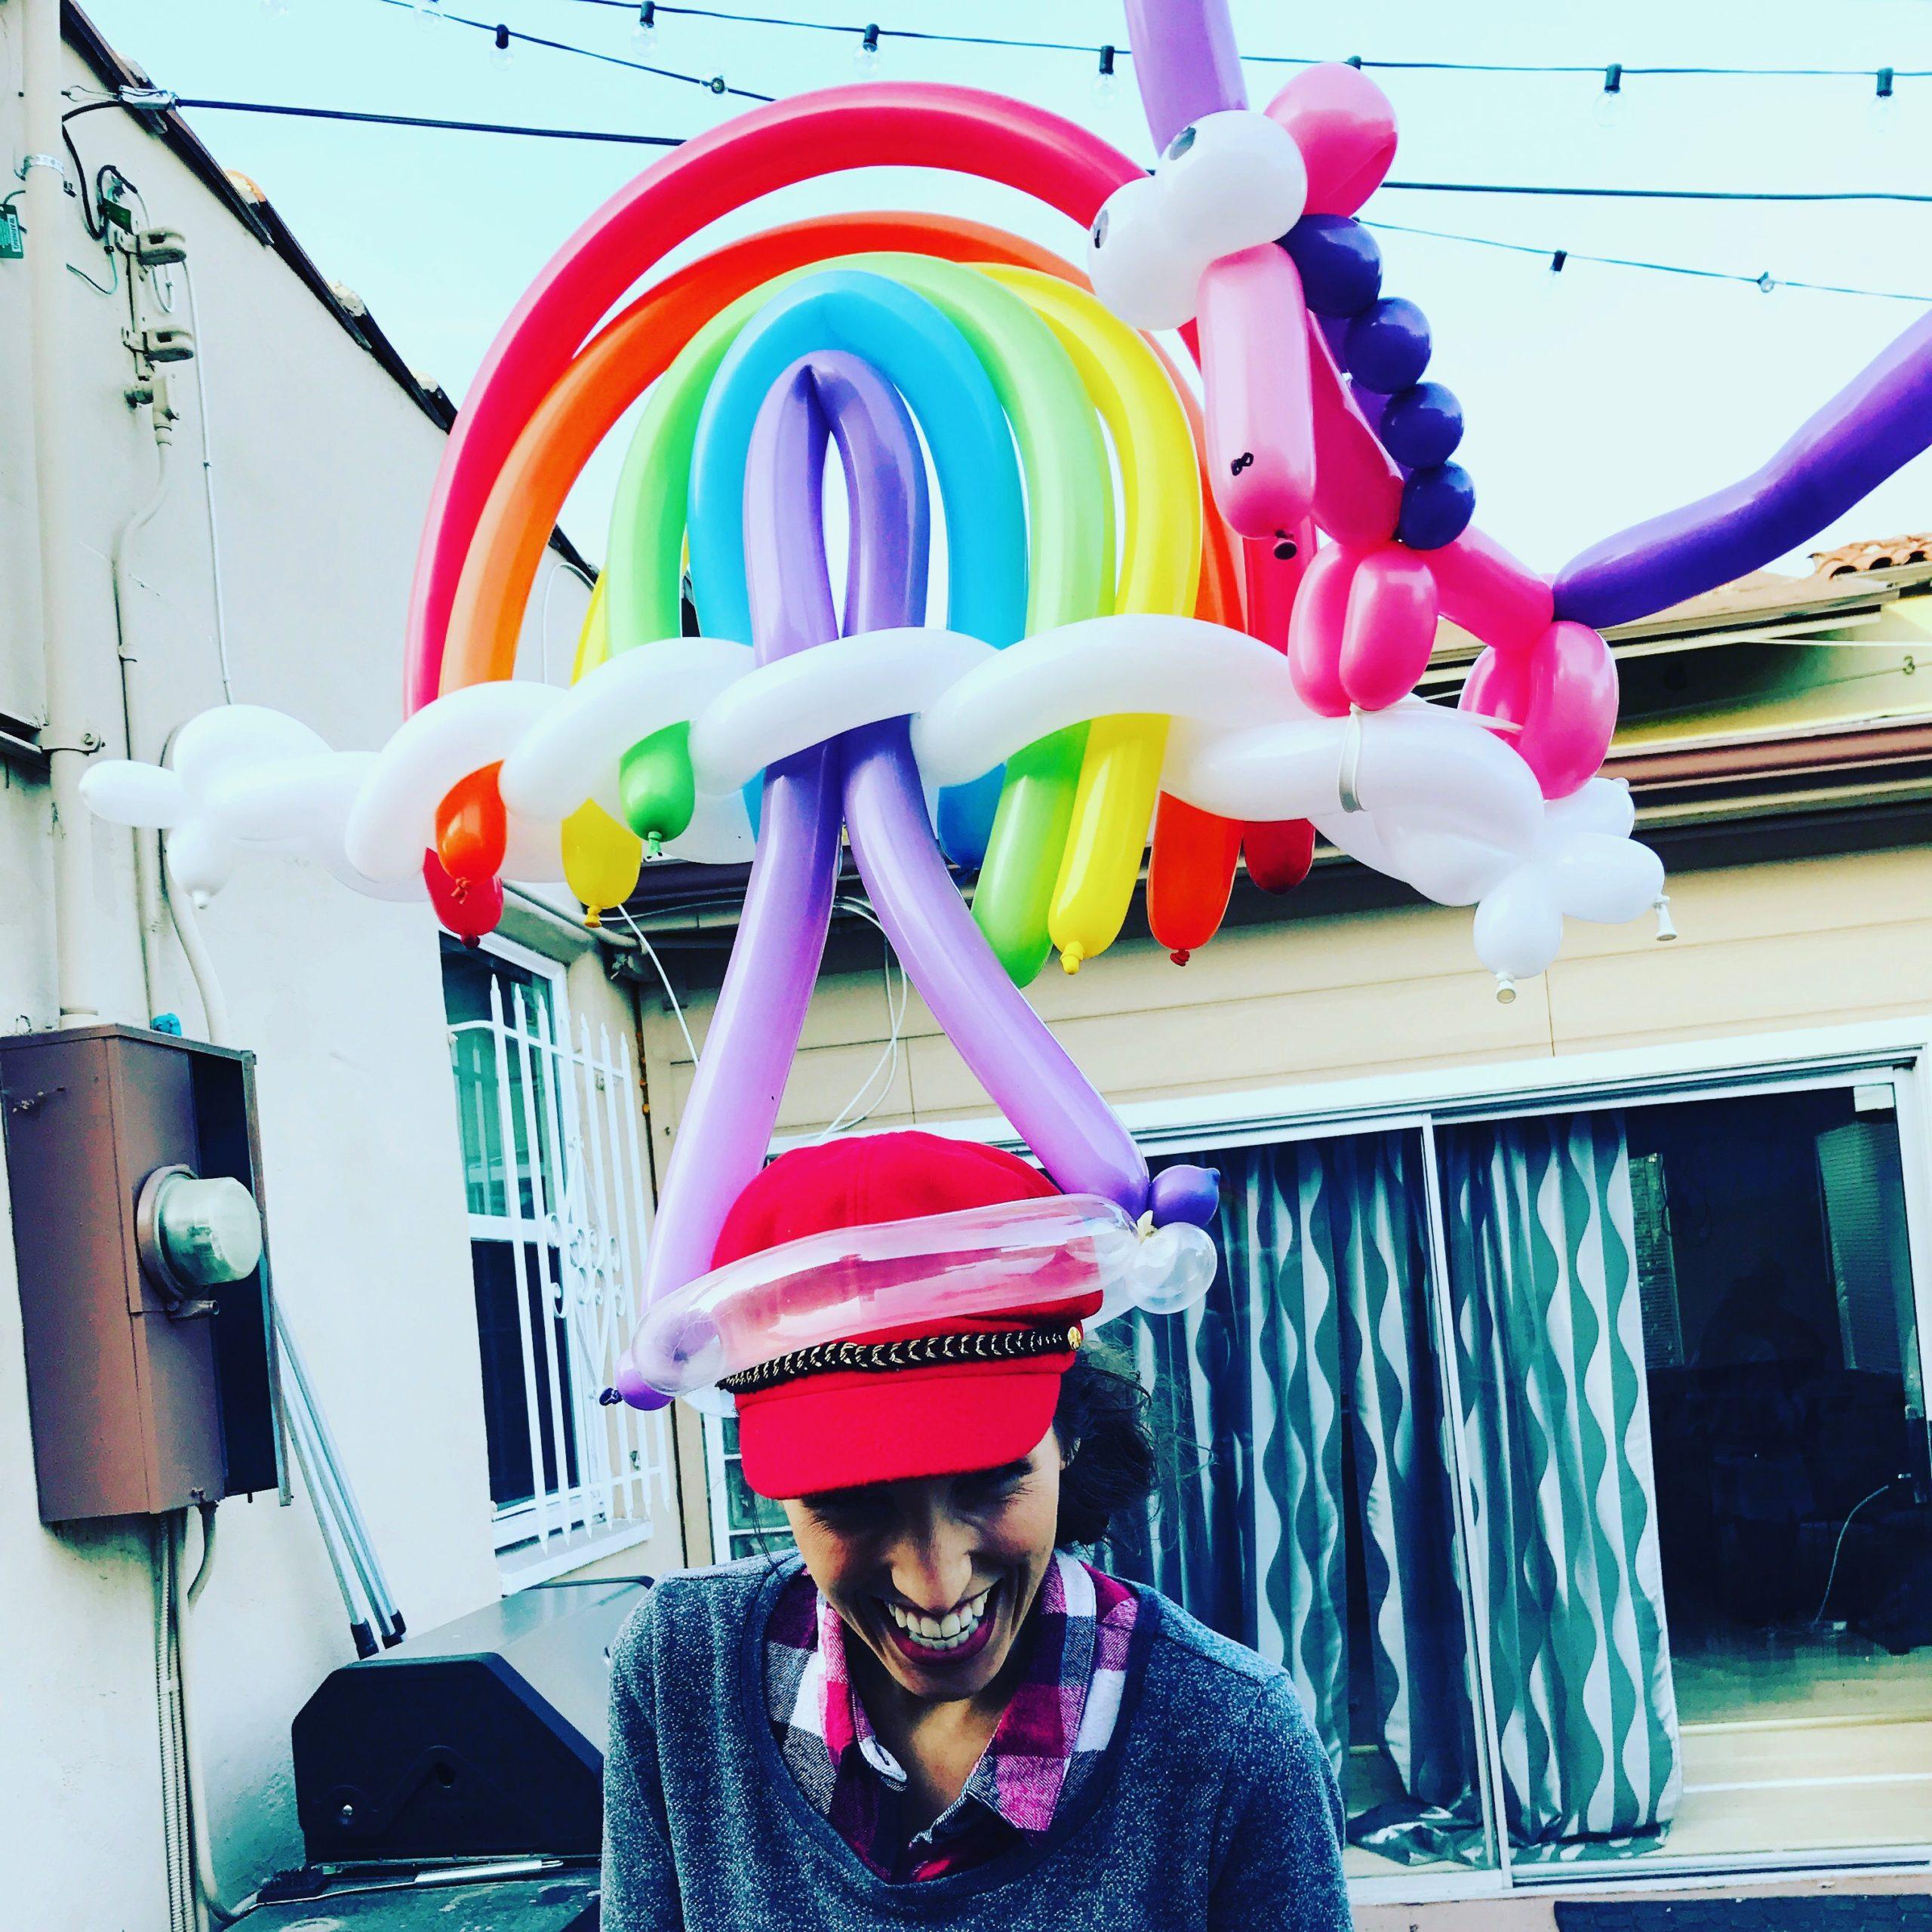 Rainbow Unicorn by The Balloon Guy